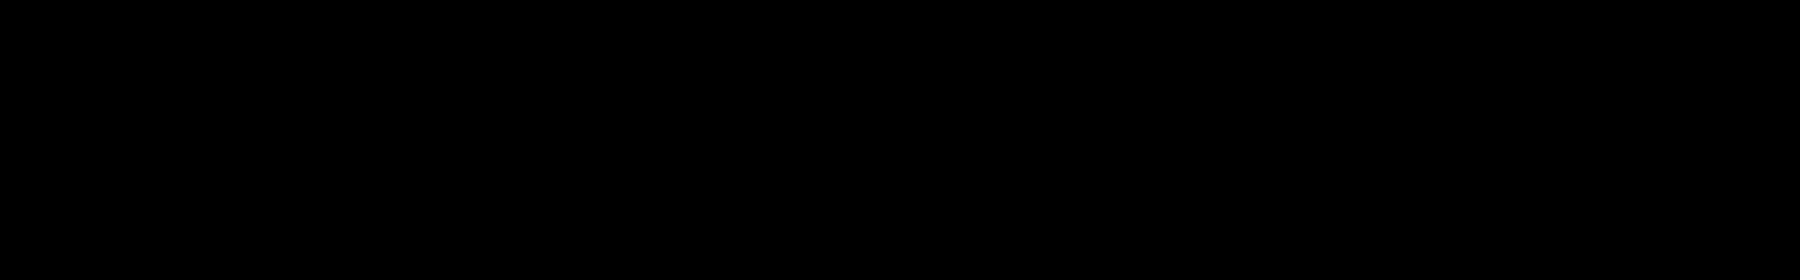 Deep Electronica audio waveform